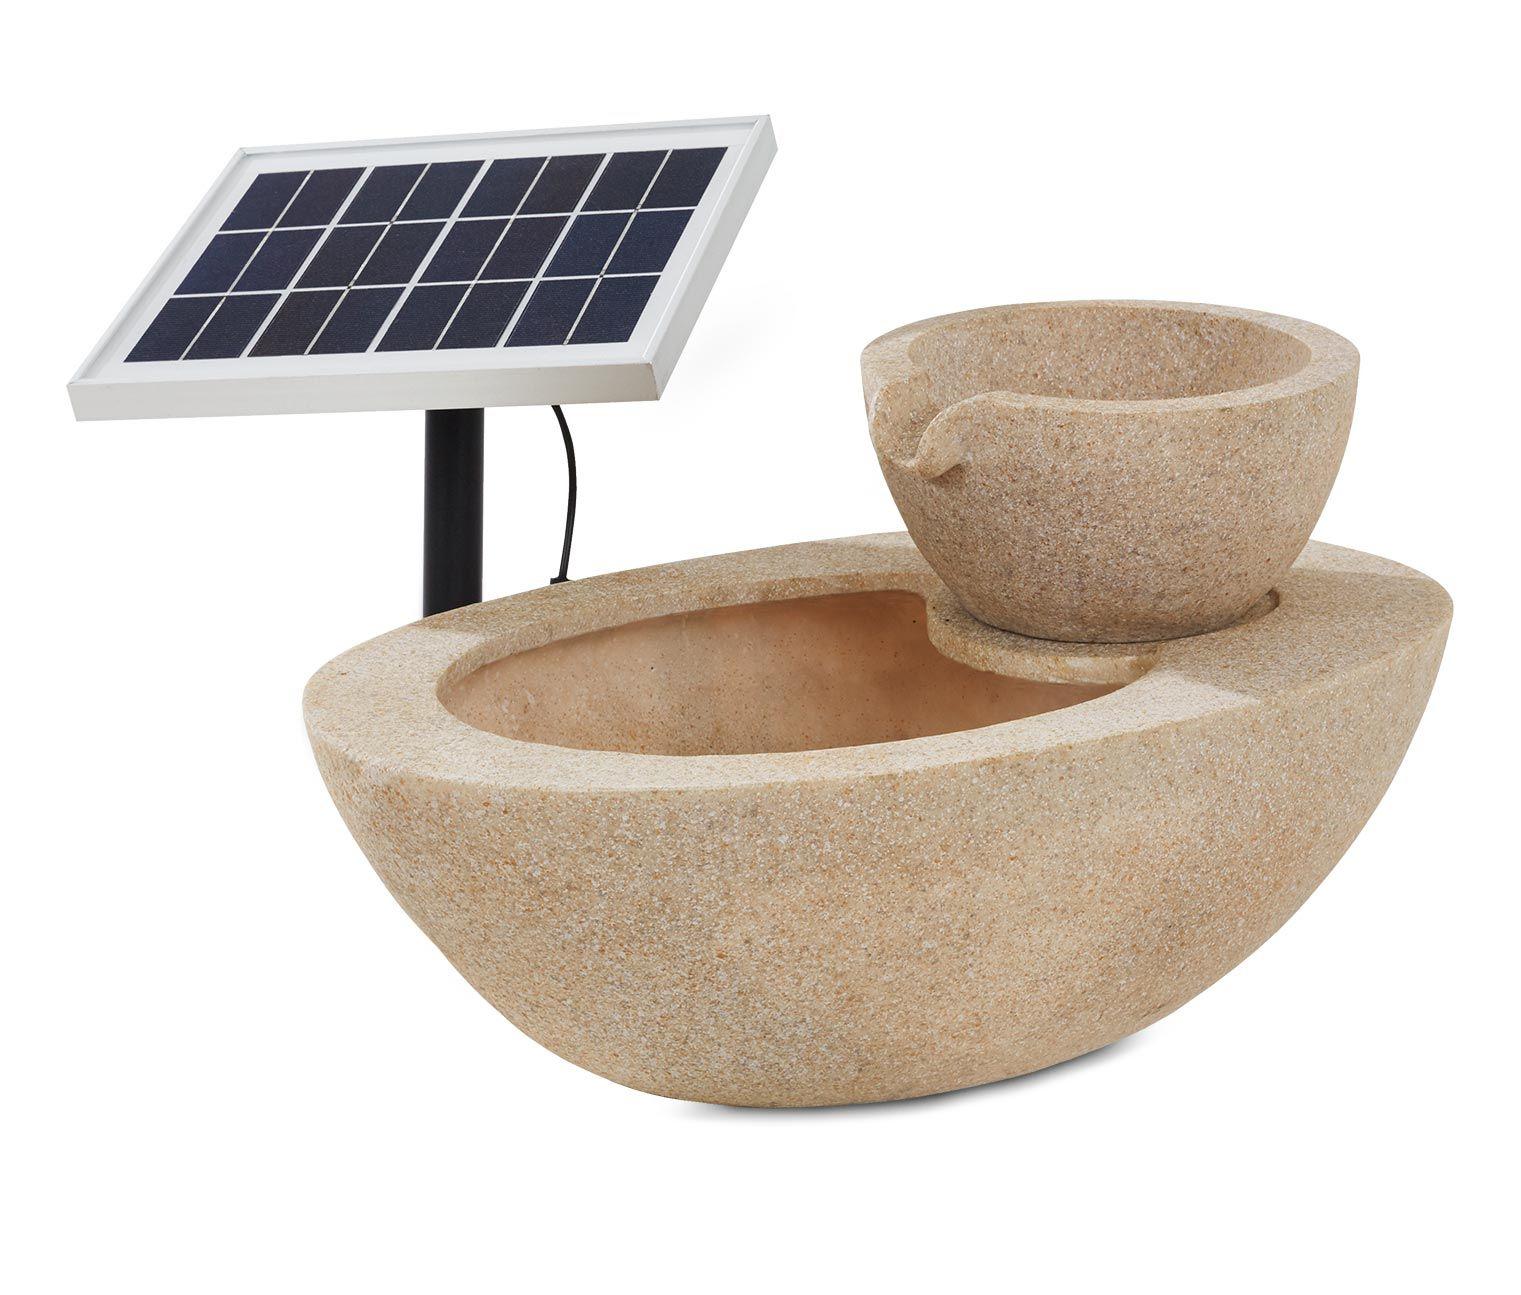 solar gartenbrunnen online bestellen bei tchibo 324977 balkon und garten ideen pinterest. Black Bedroom Furniture Sets. Home Design Ideas